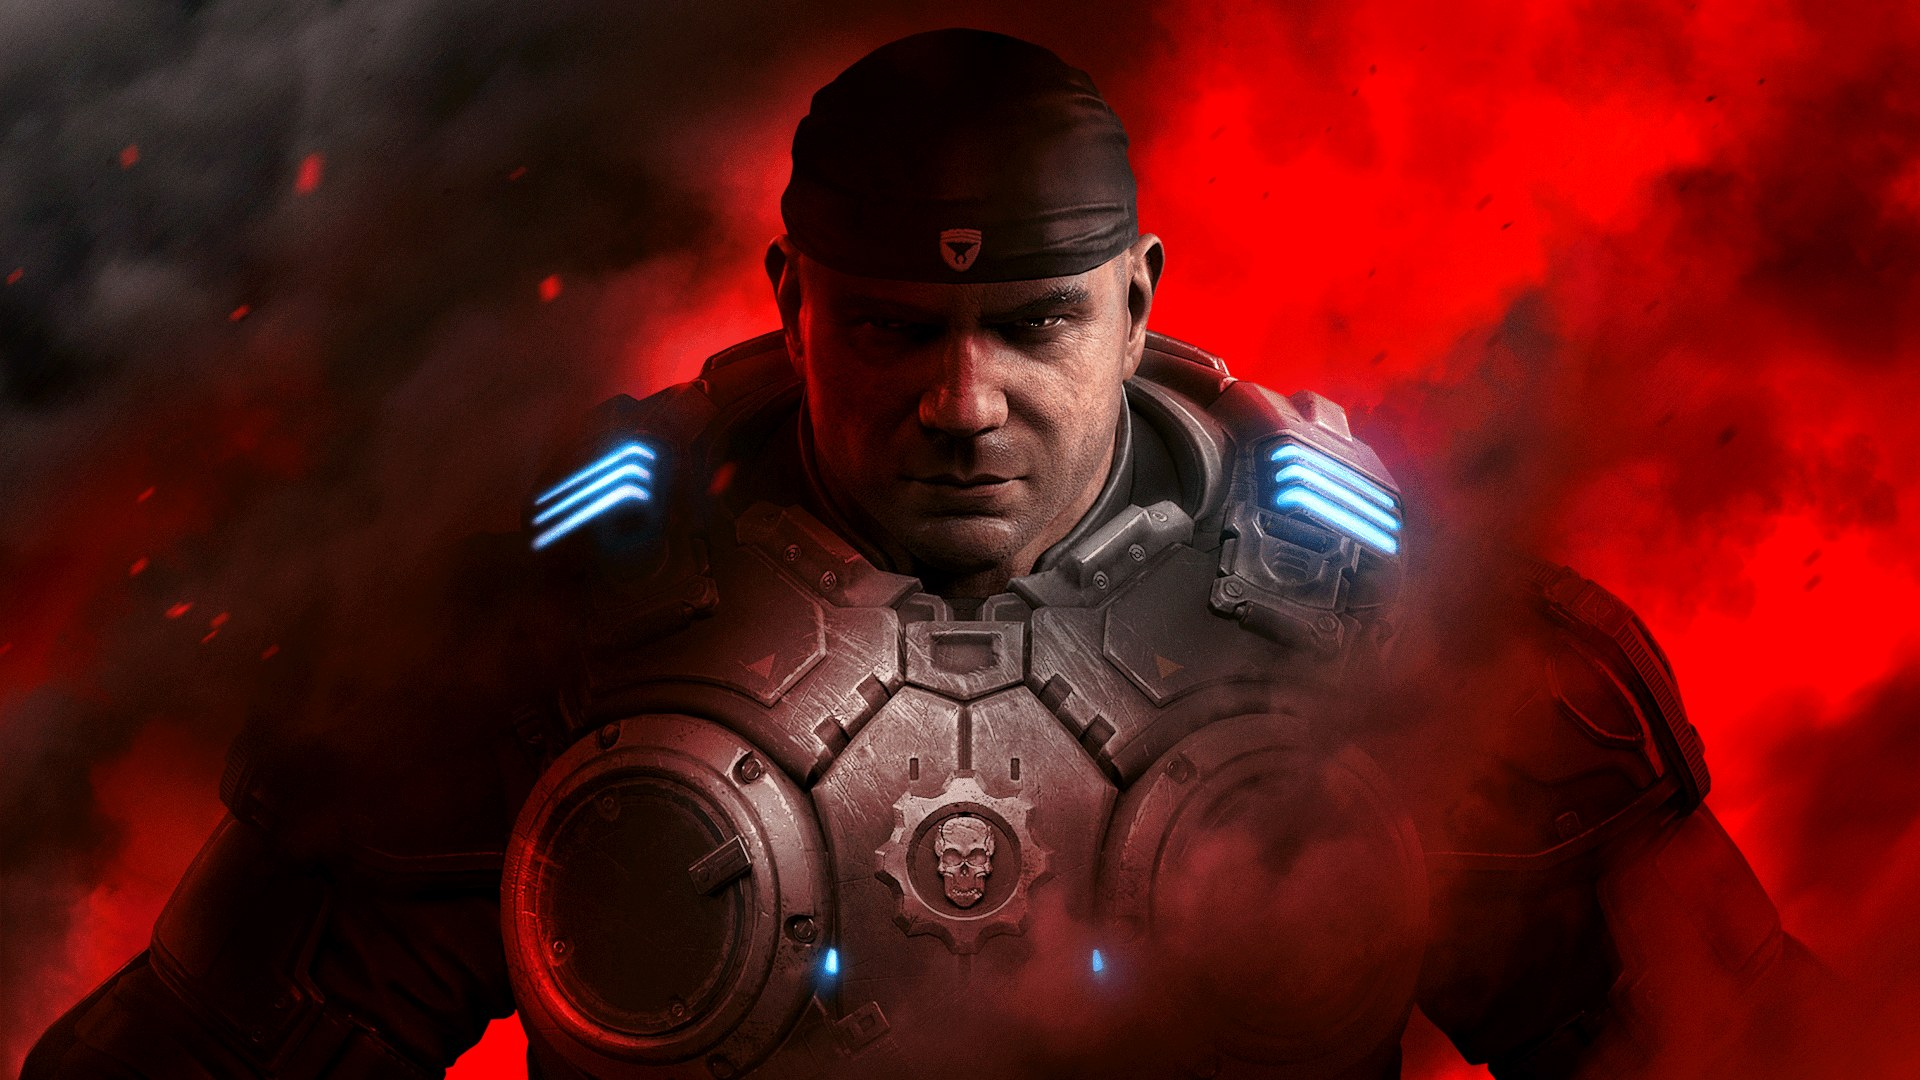 Dave Batista as Marcus Fenix in Gears 5, weirdly.